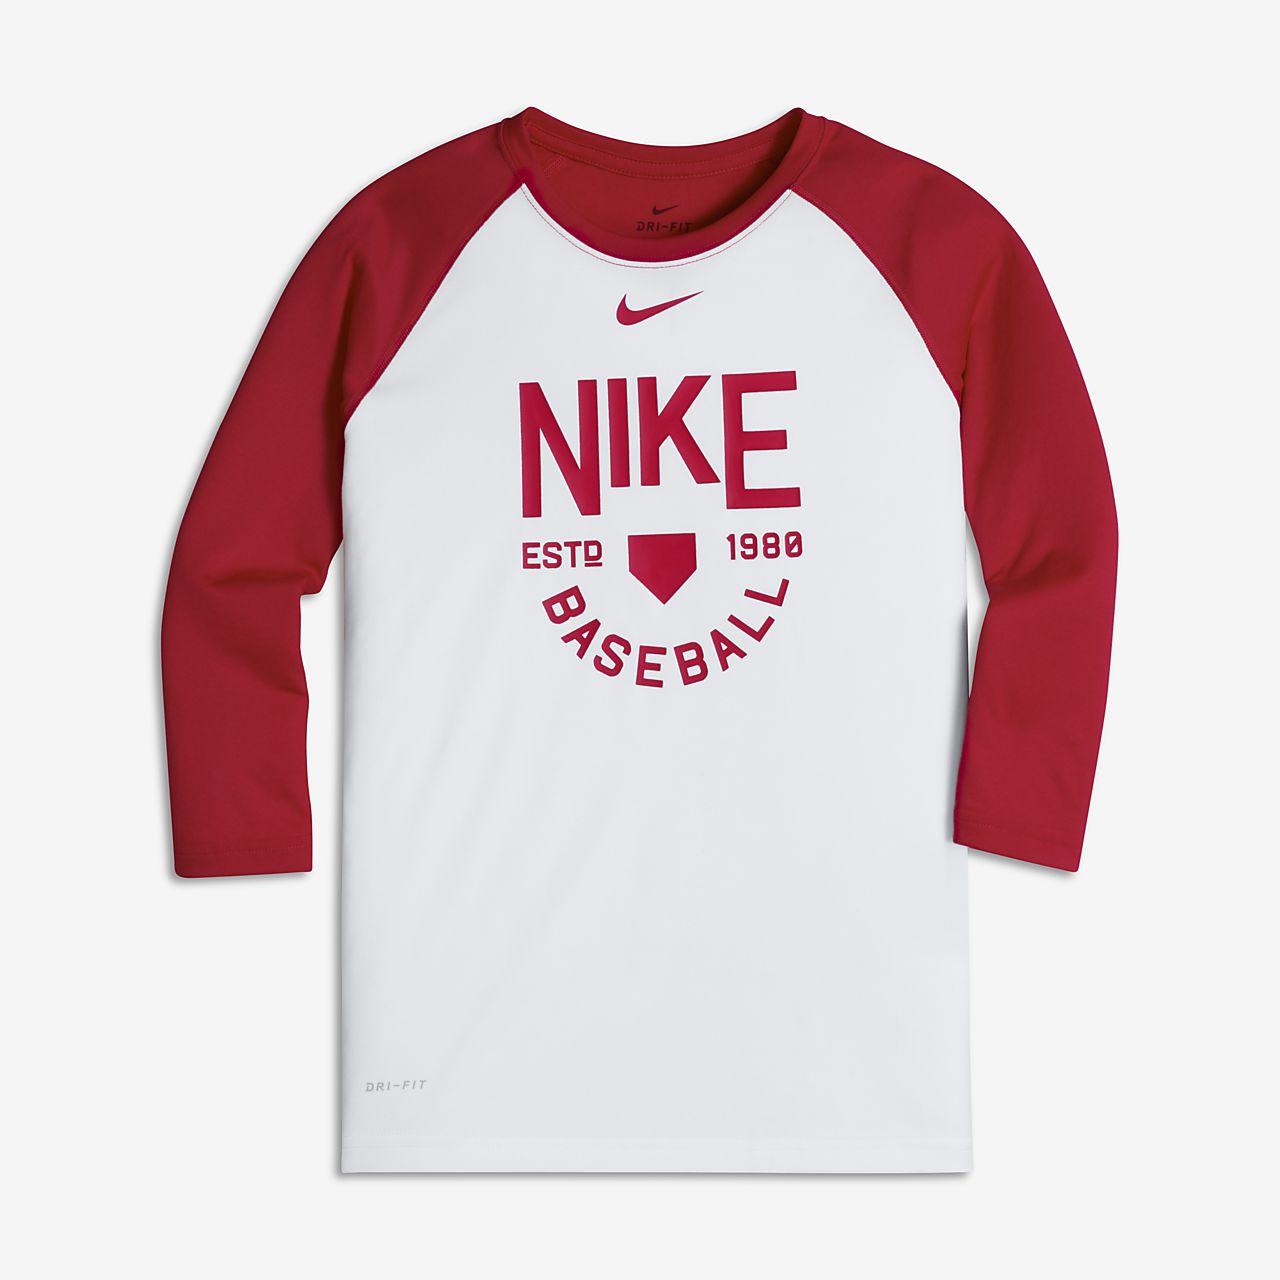 Boys\' Shirts & Tops. Nike.com